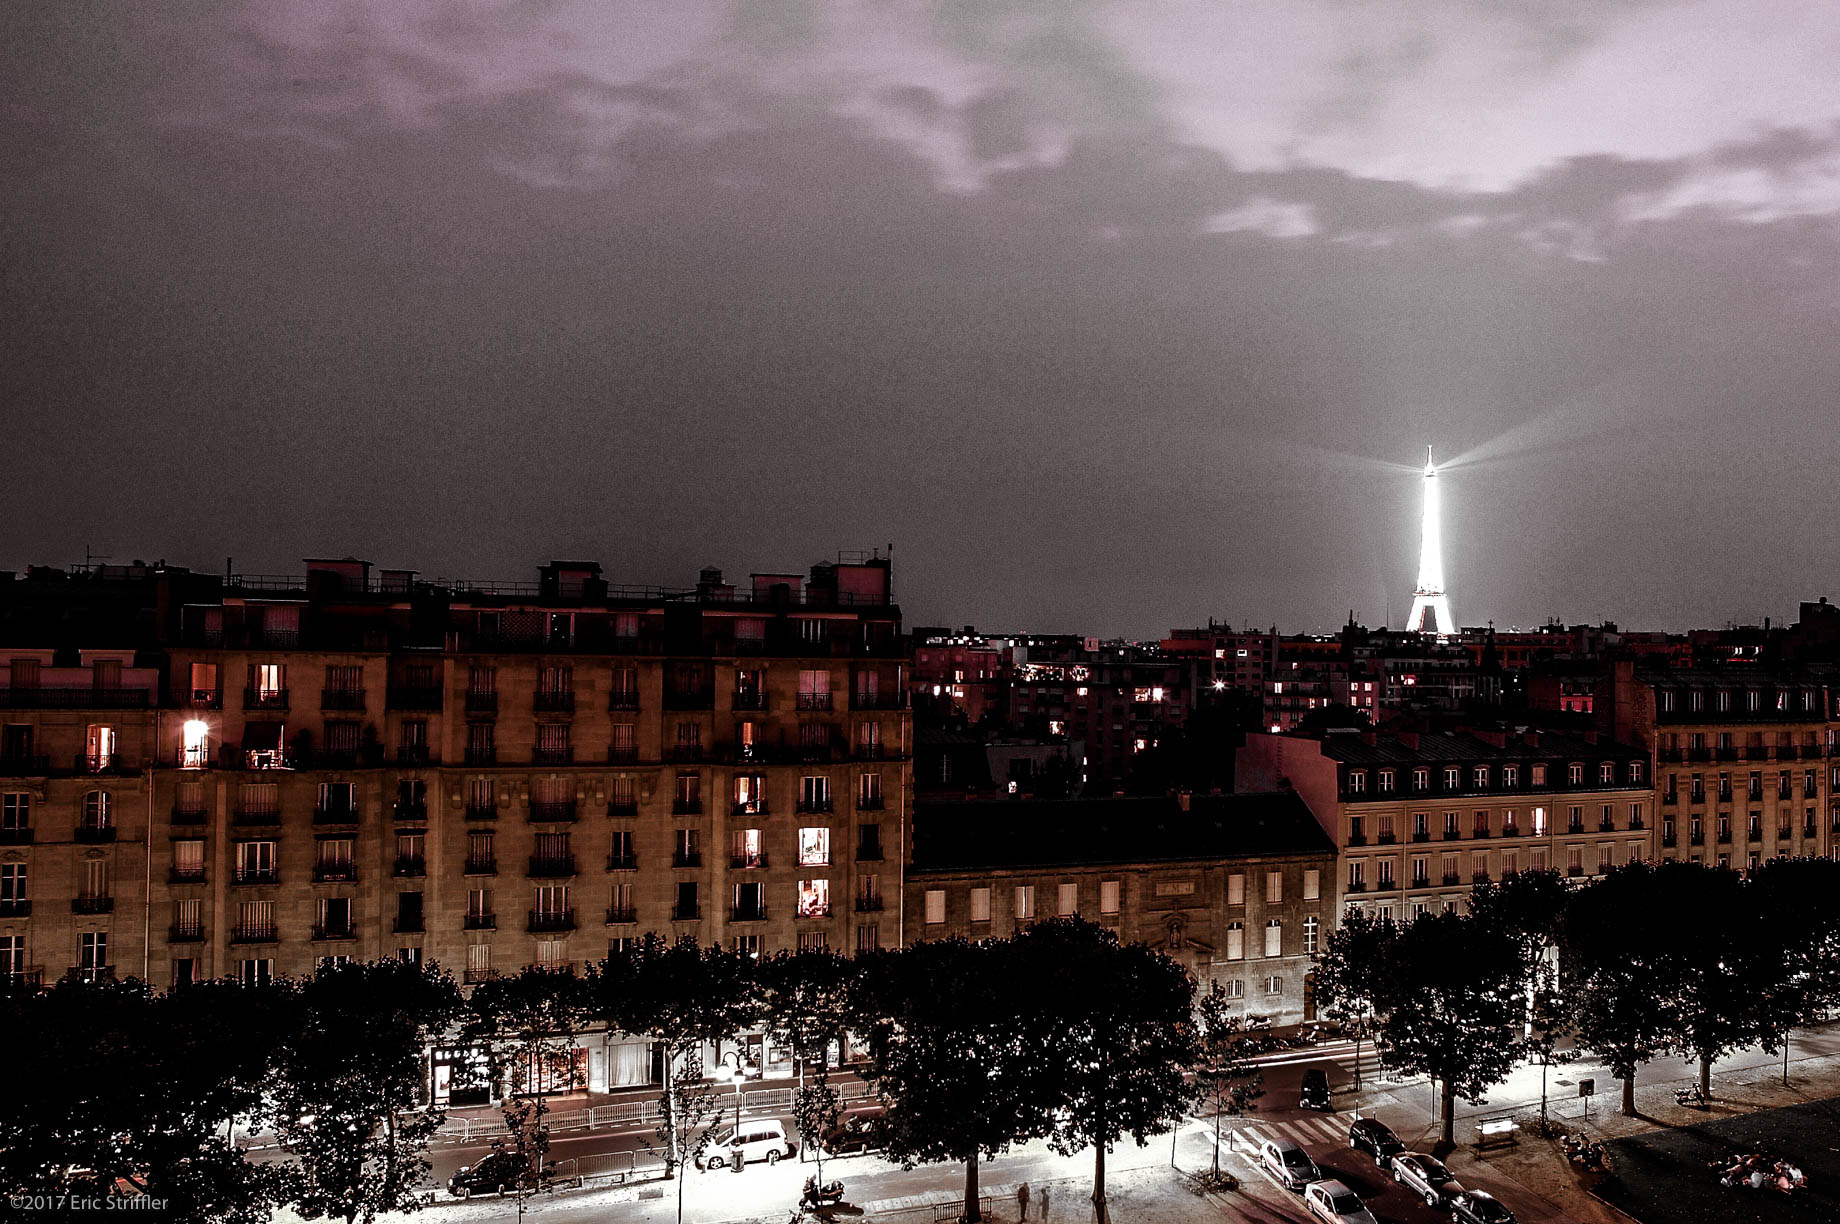 eric_striffler_photography_travel-117.jpg